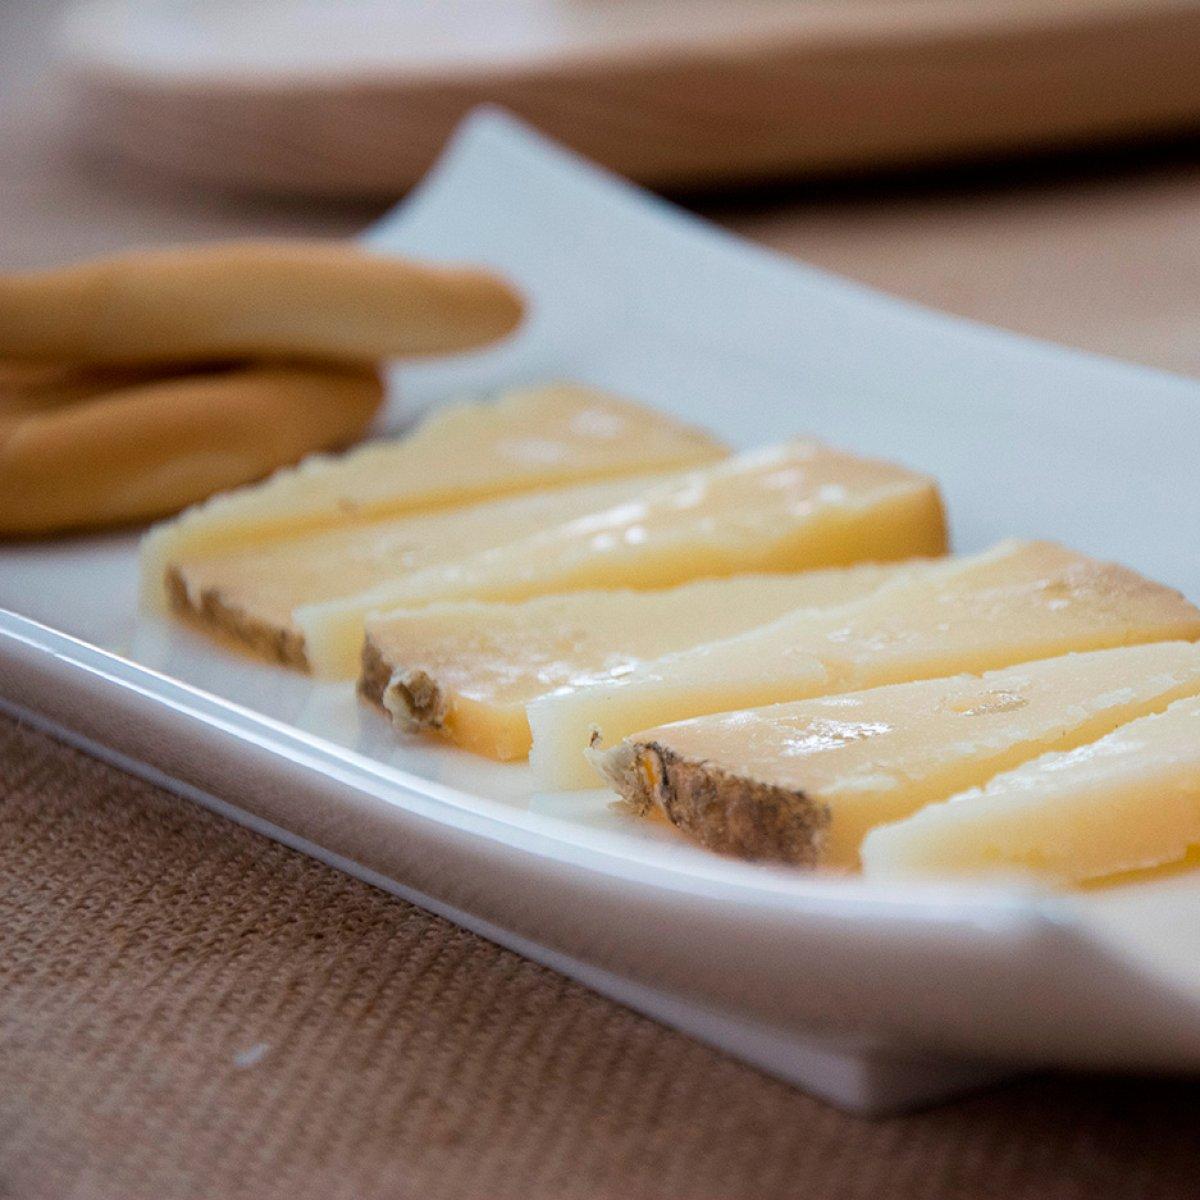 Cuña de queso de oveja curado zamorano